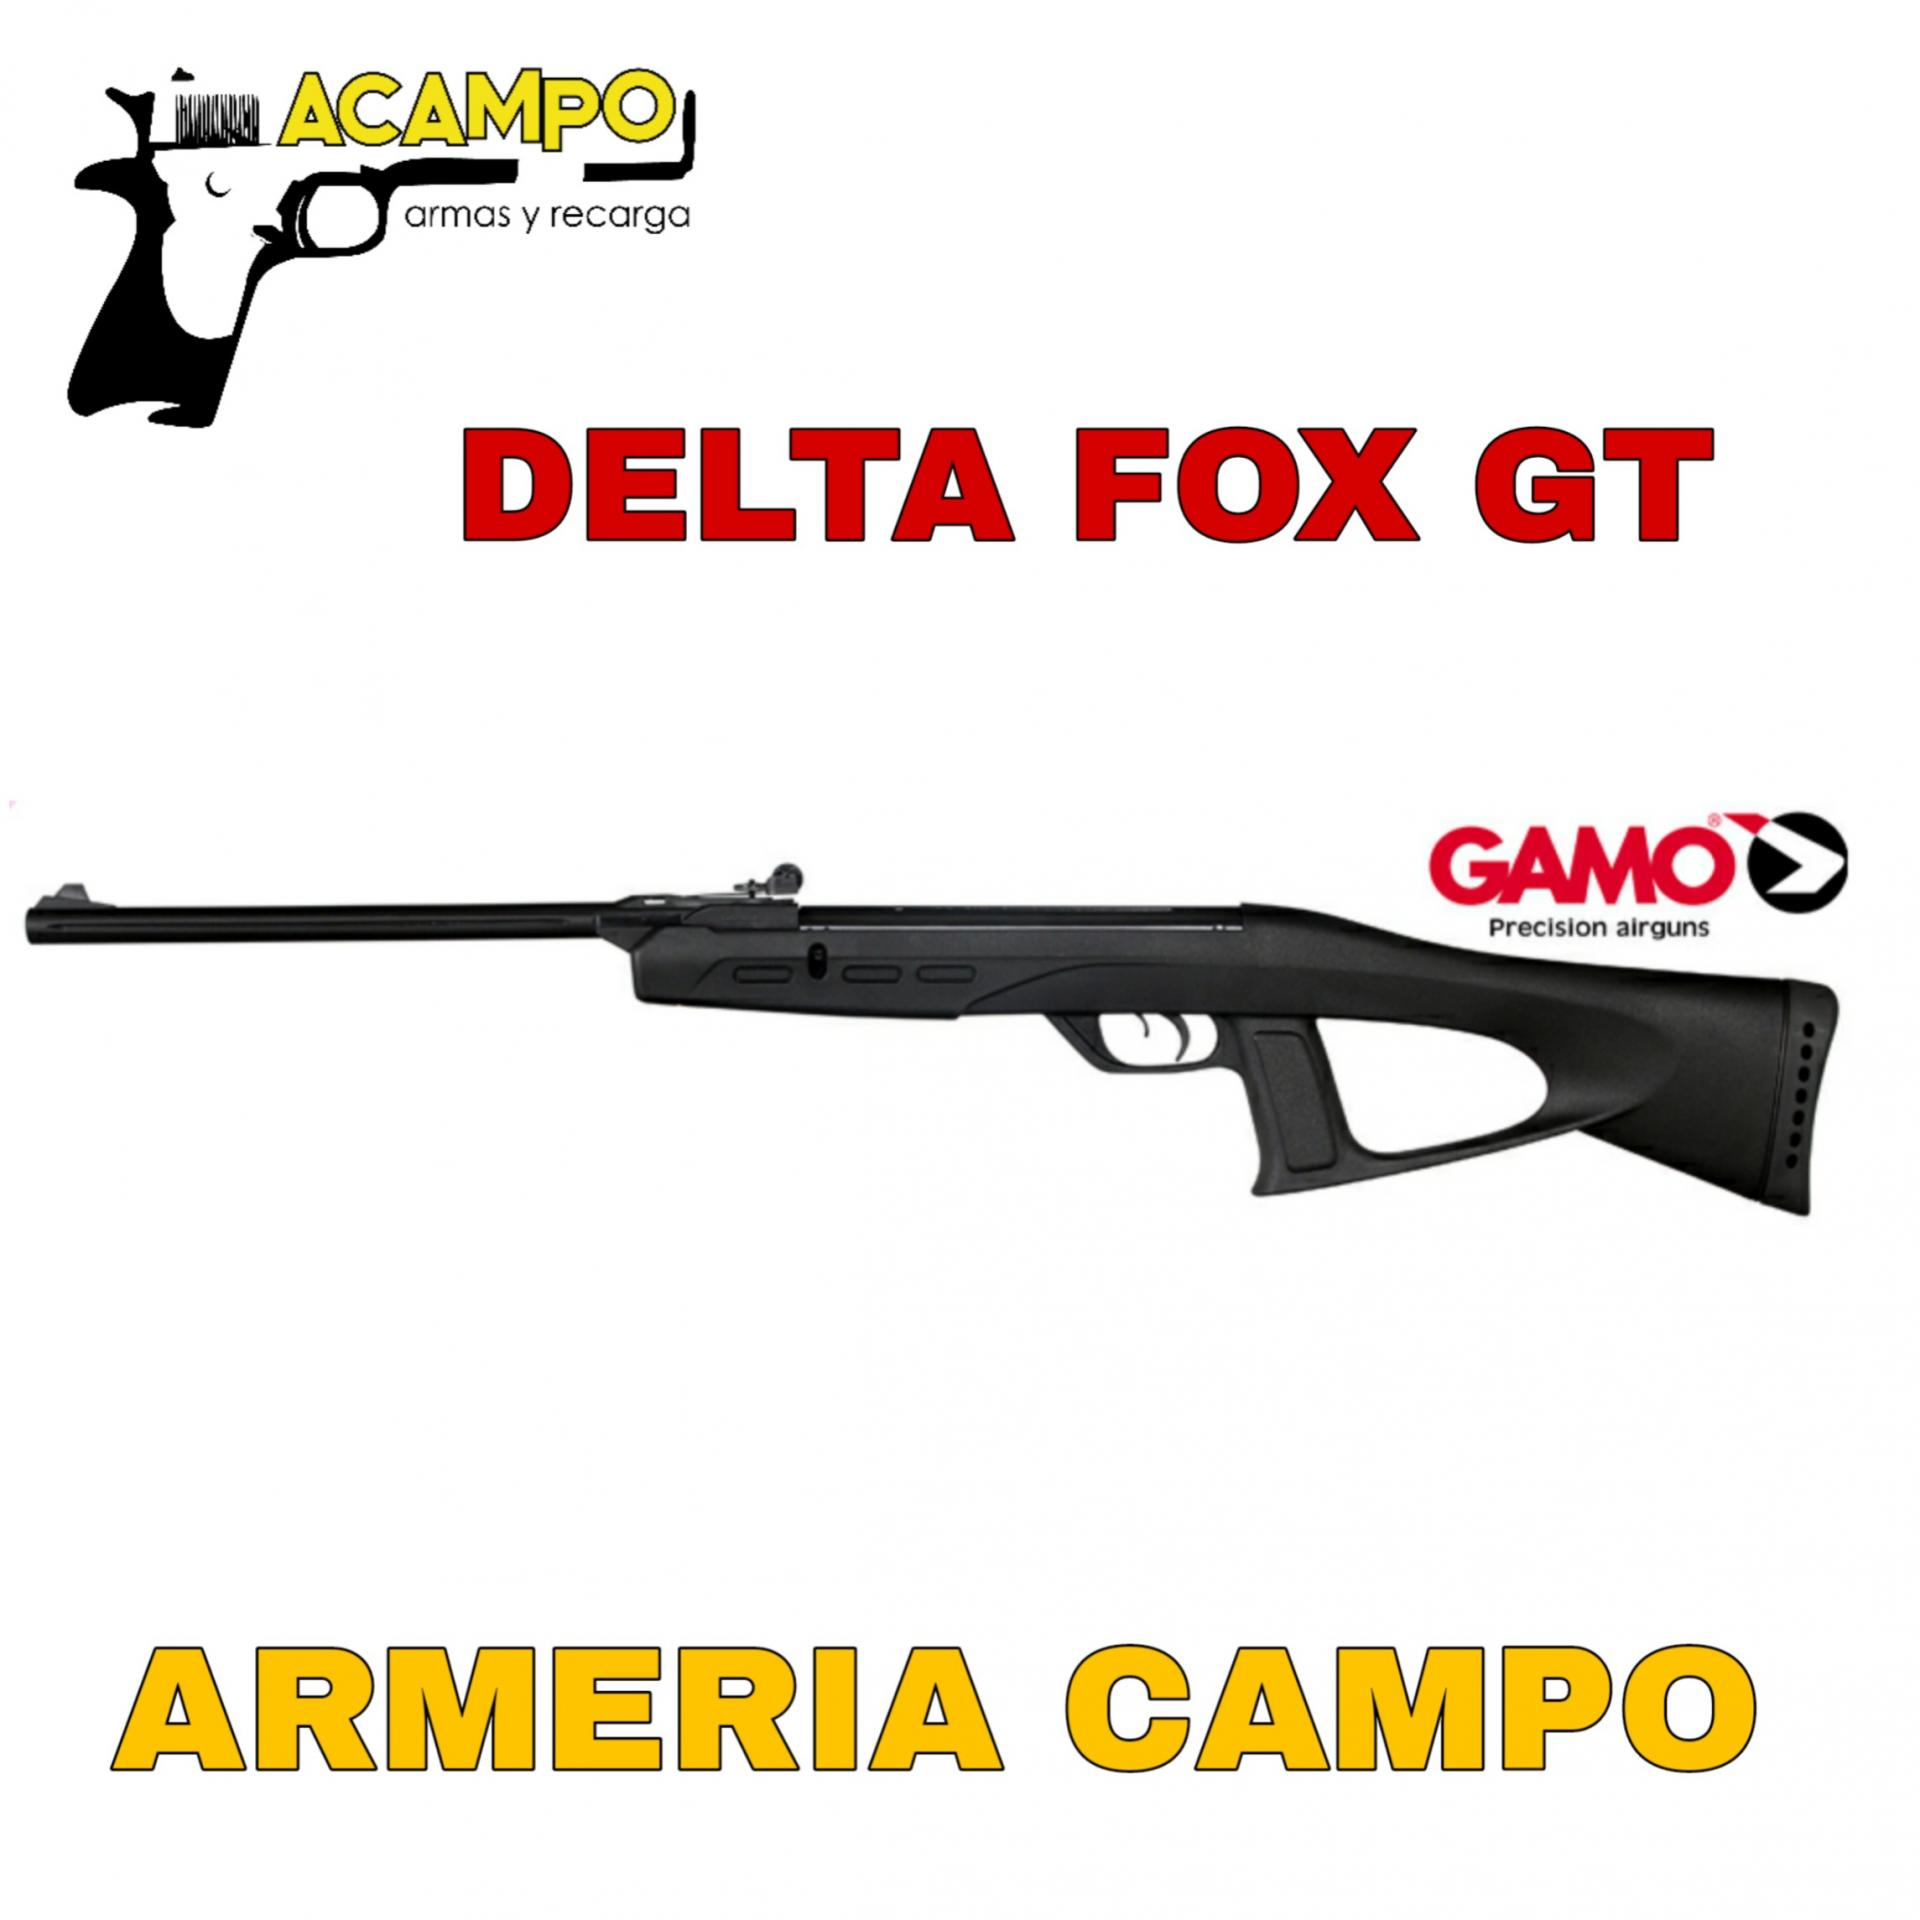 GAMO DELTA FOX GT